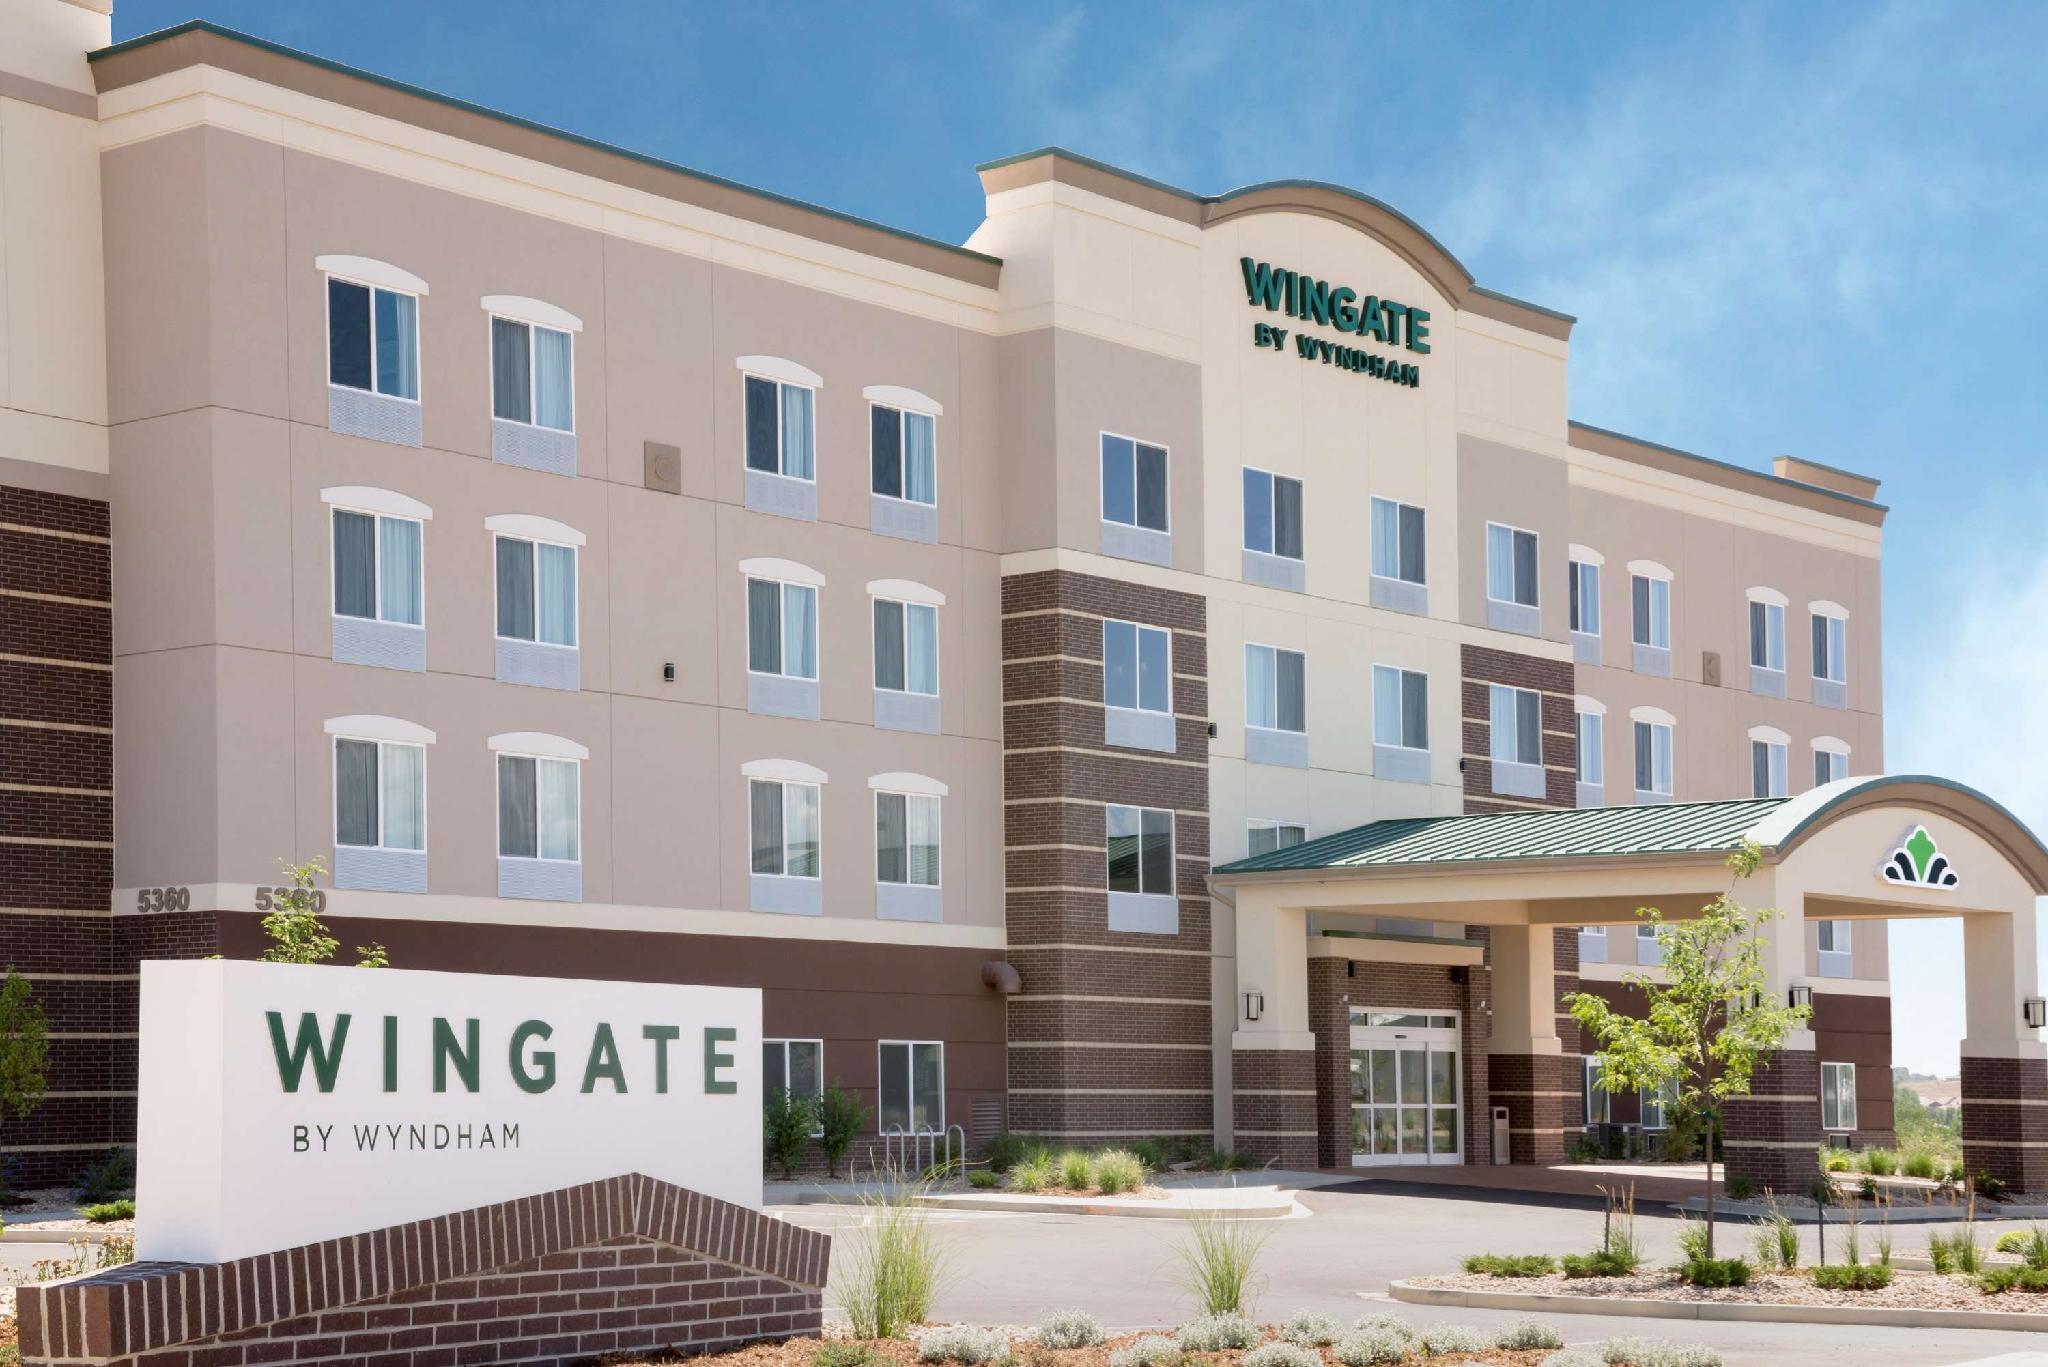 Wingate by Wyndham Denver Airport